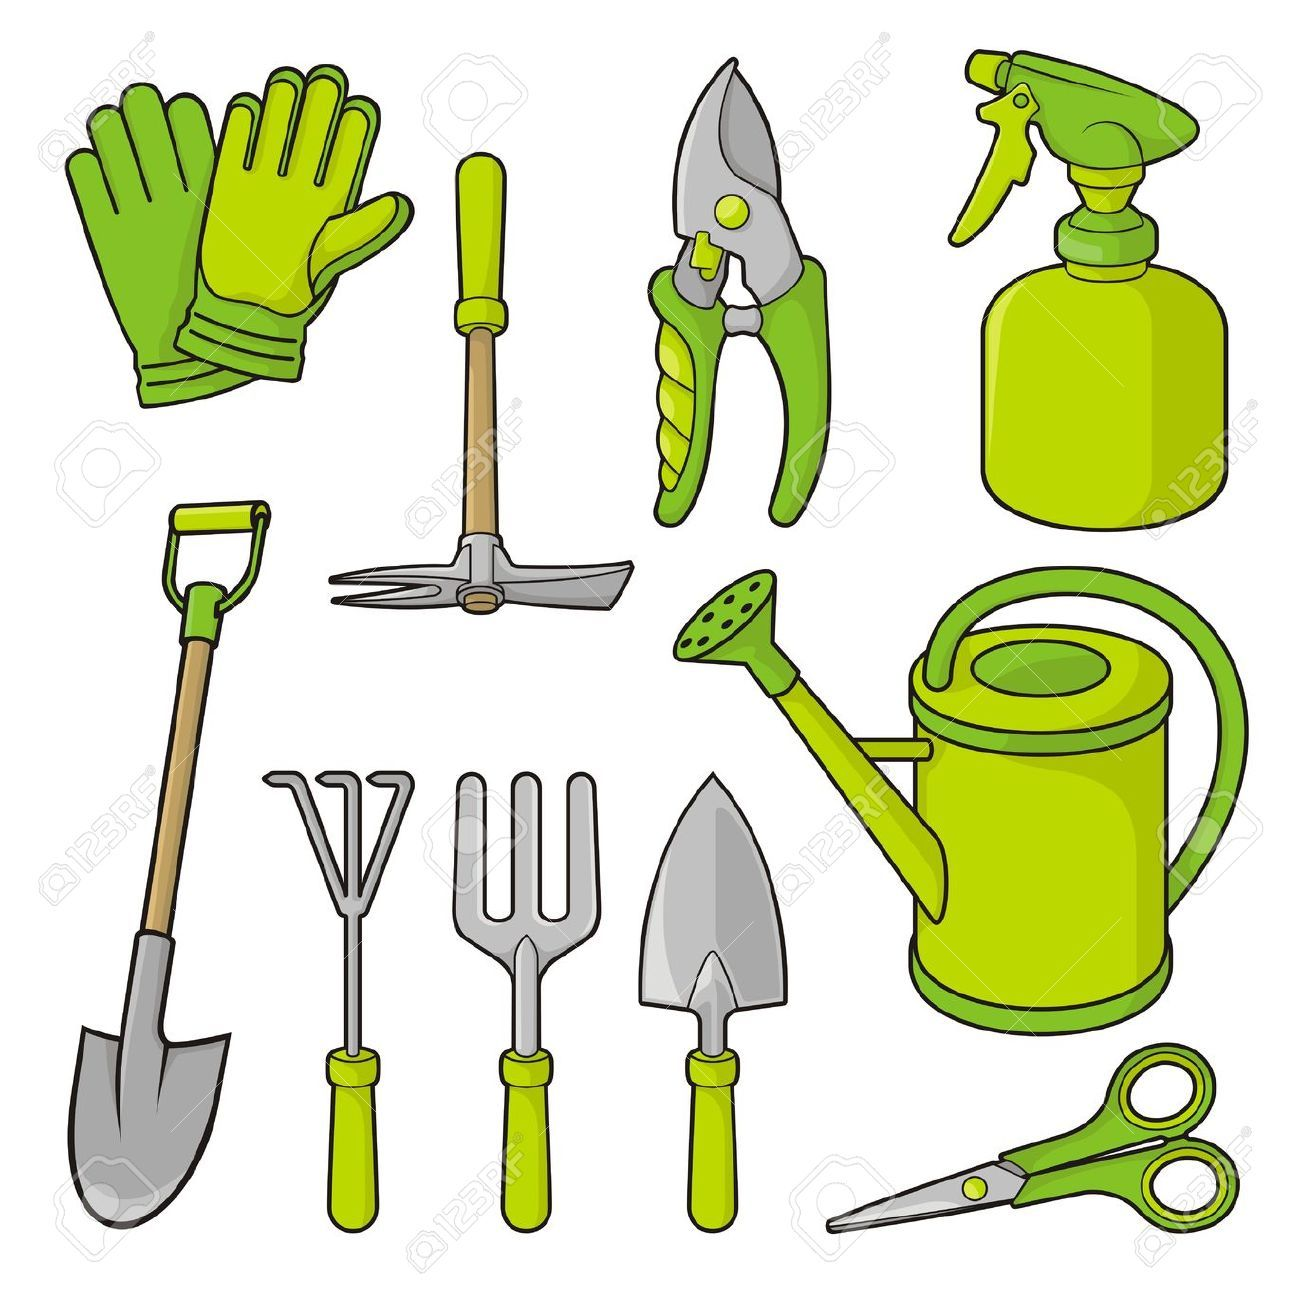 Gardener clipart gardening fork. Pin on tools